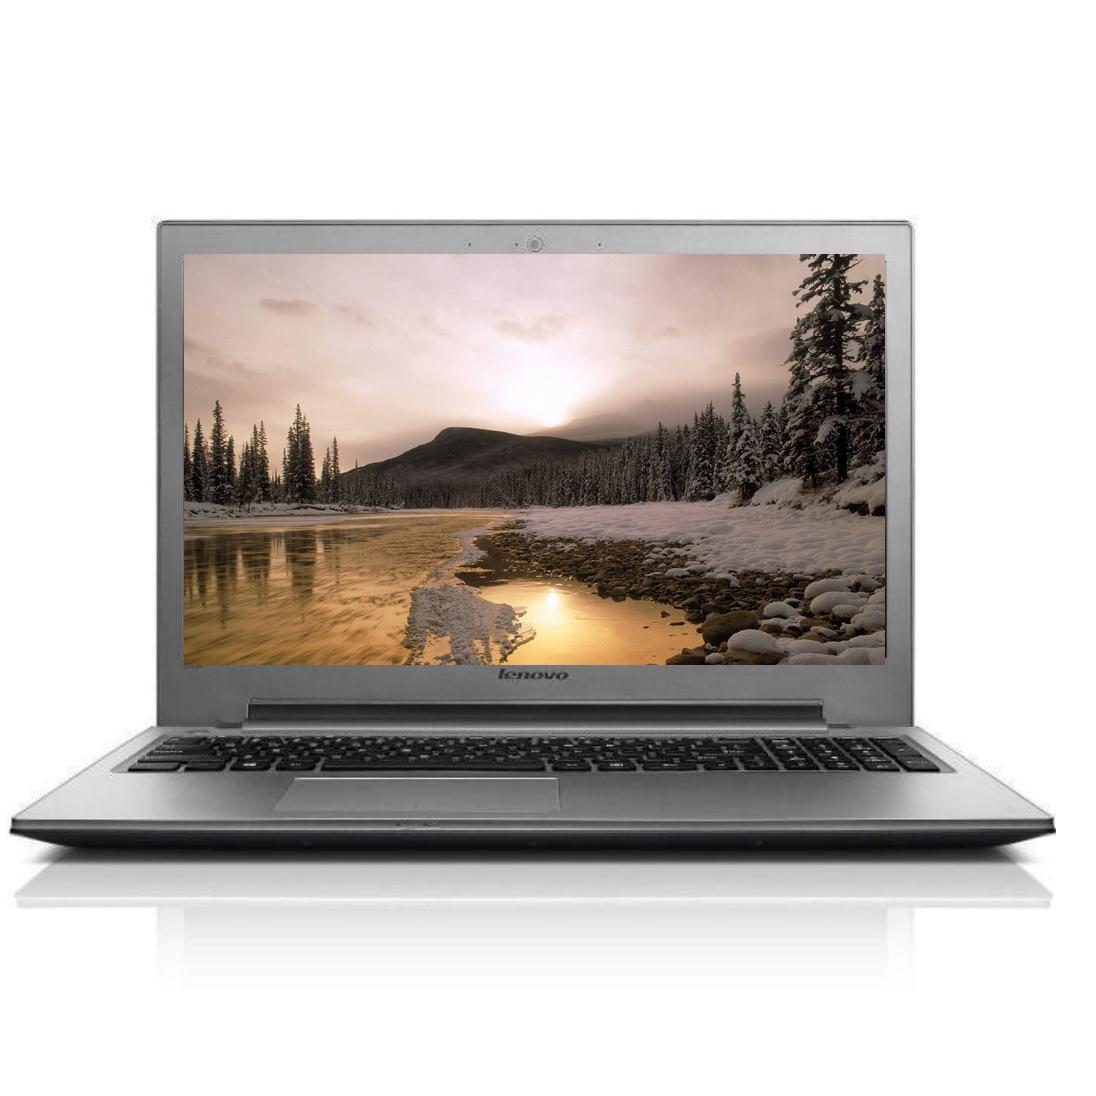 "Lenovo Ideapad Z500 15,6"" Core i5 2,6 GHz  - 1 To HDD + SSD - RAM 4 Go"